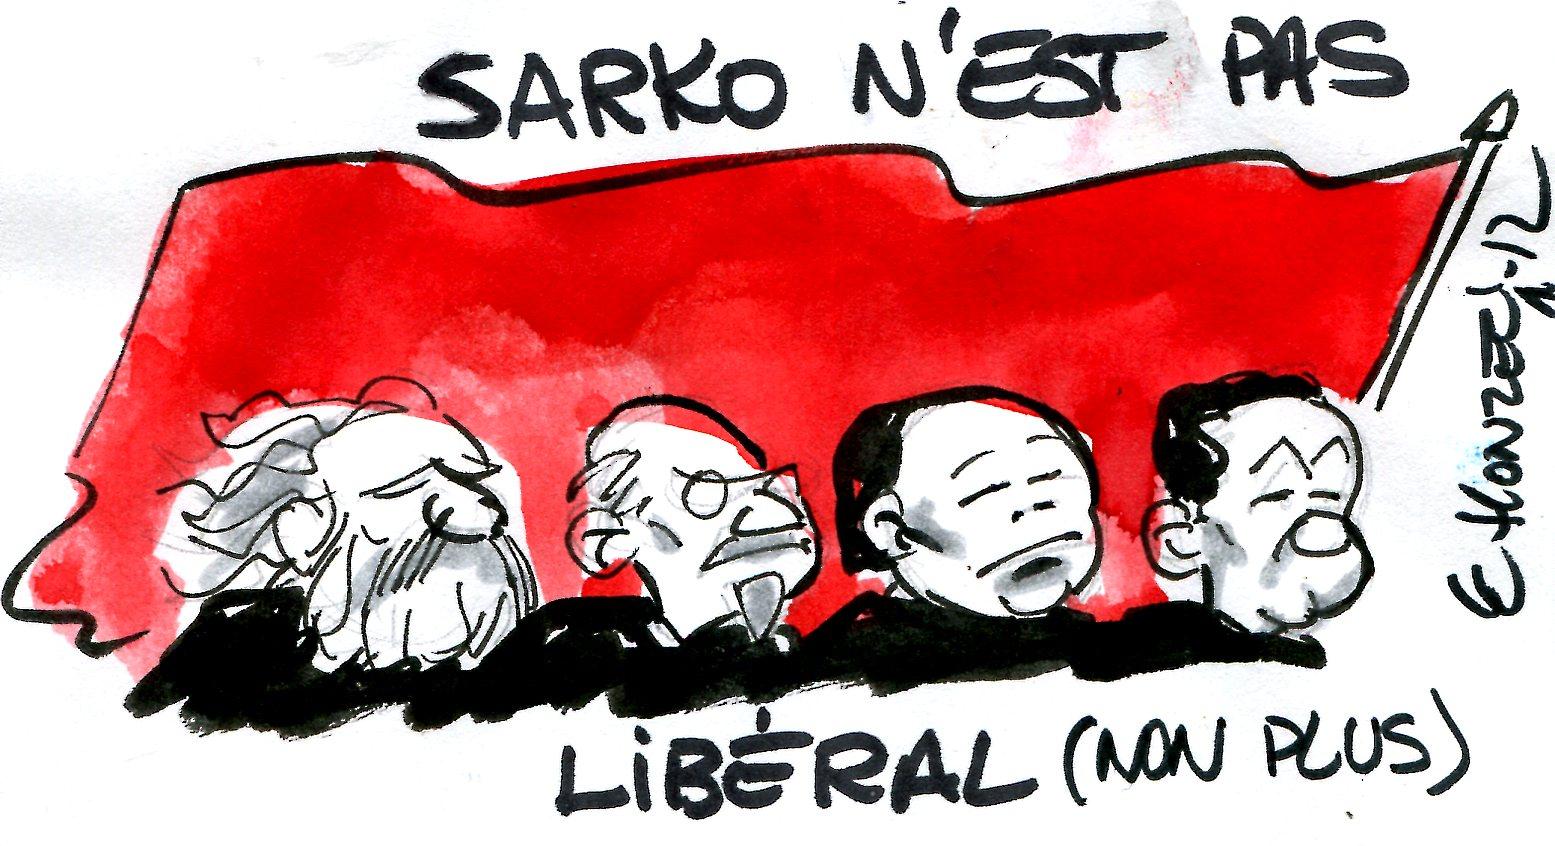 Nicolas Sarkozy, fervent opposant au libéralisme